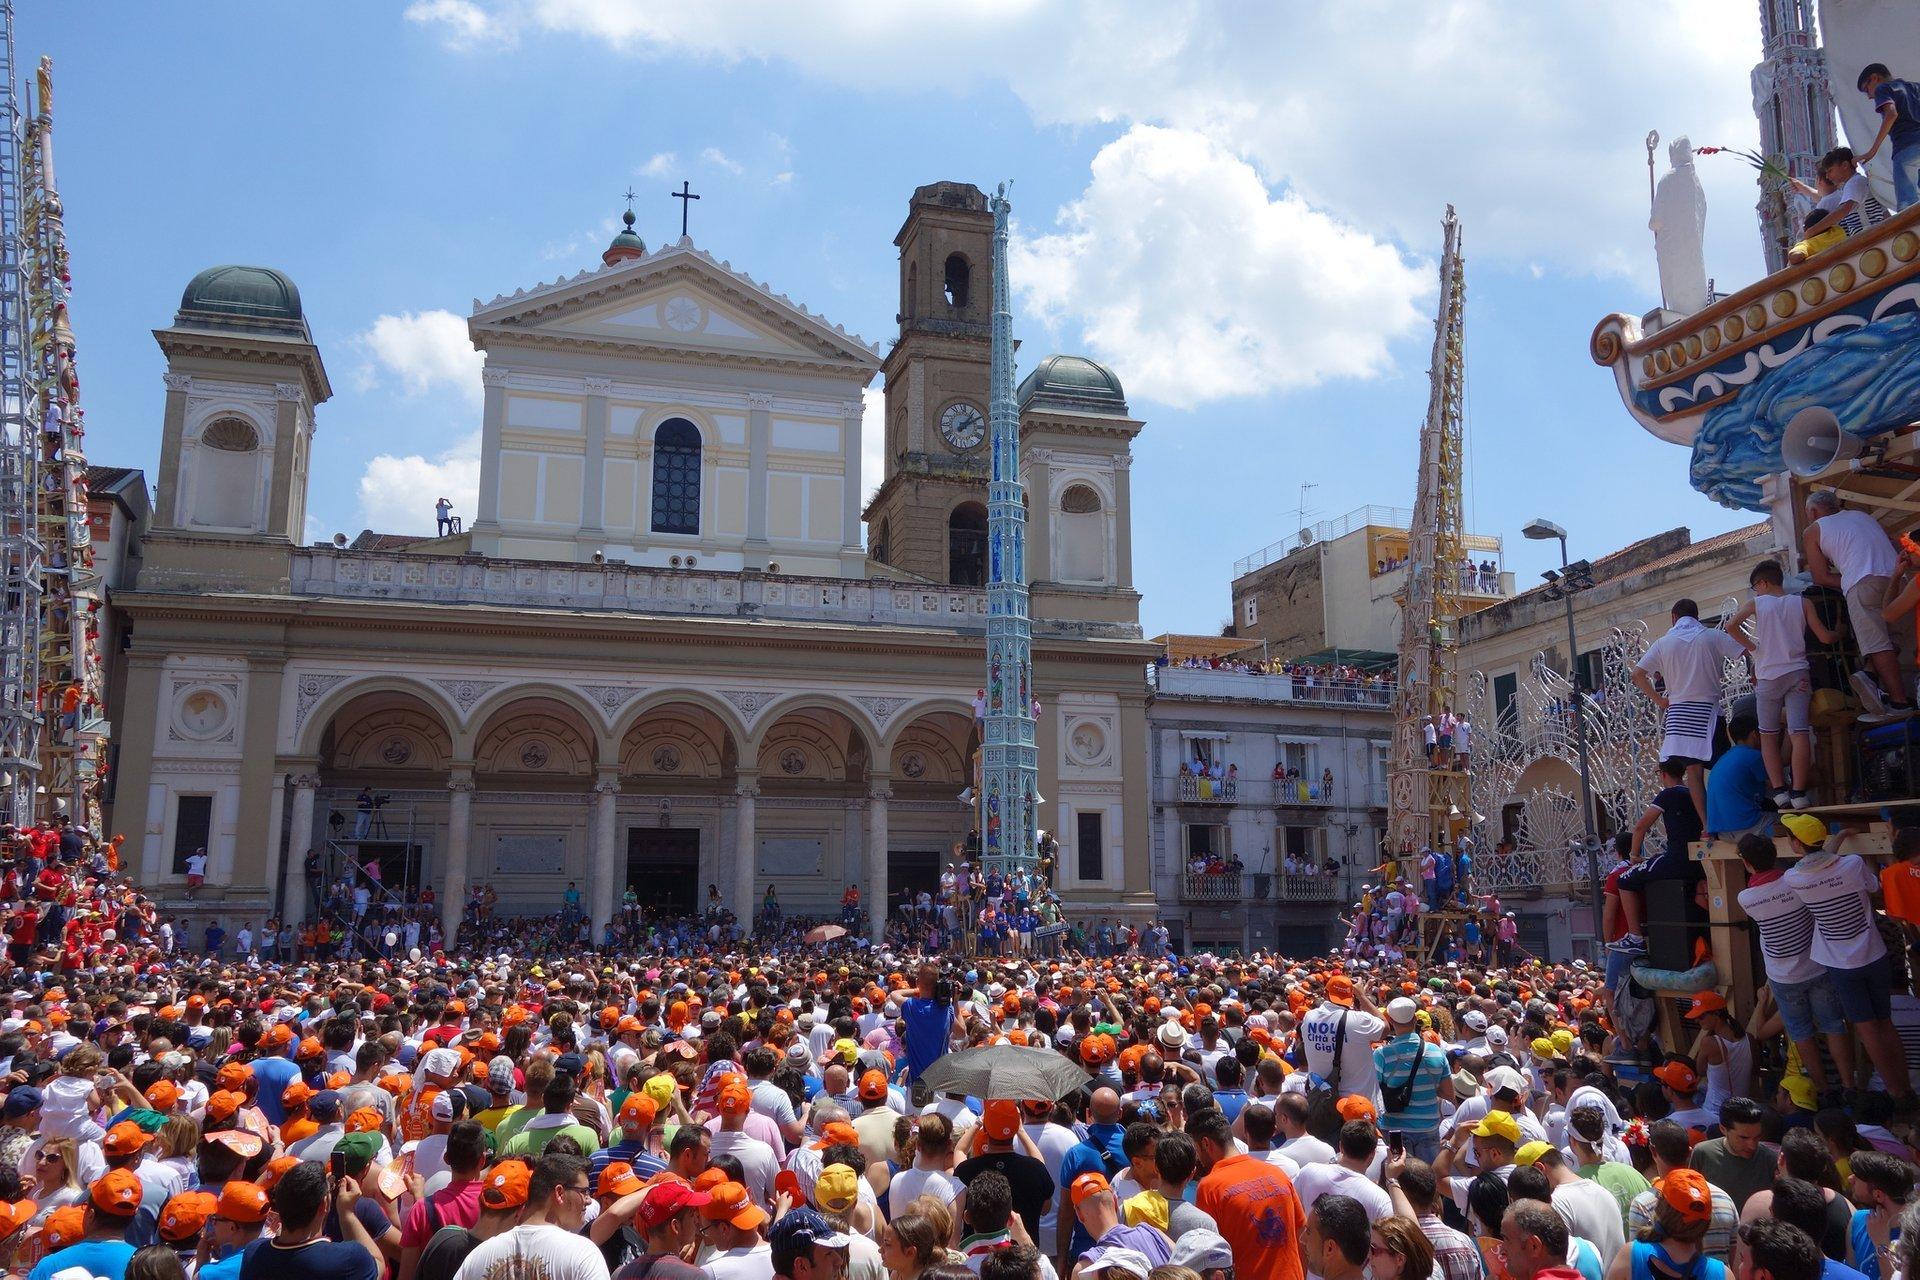 Festa dei Gigli in Nola in Naples and Pompeii - Best Season 2020